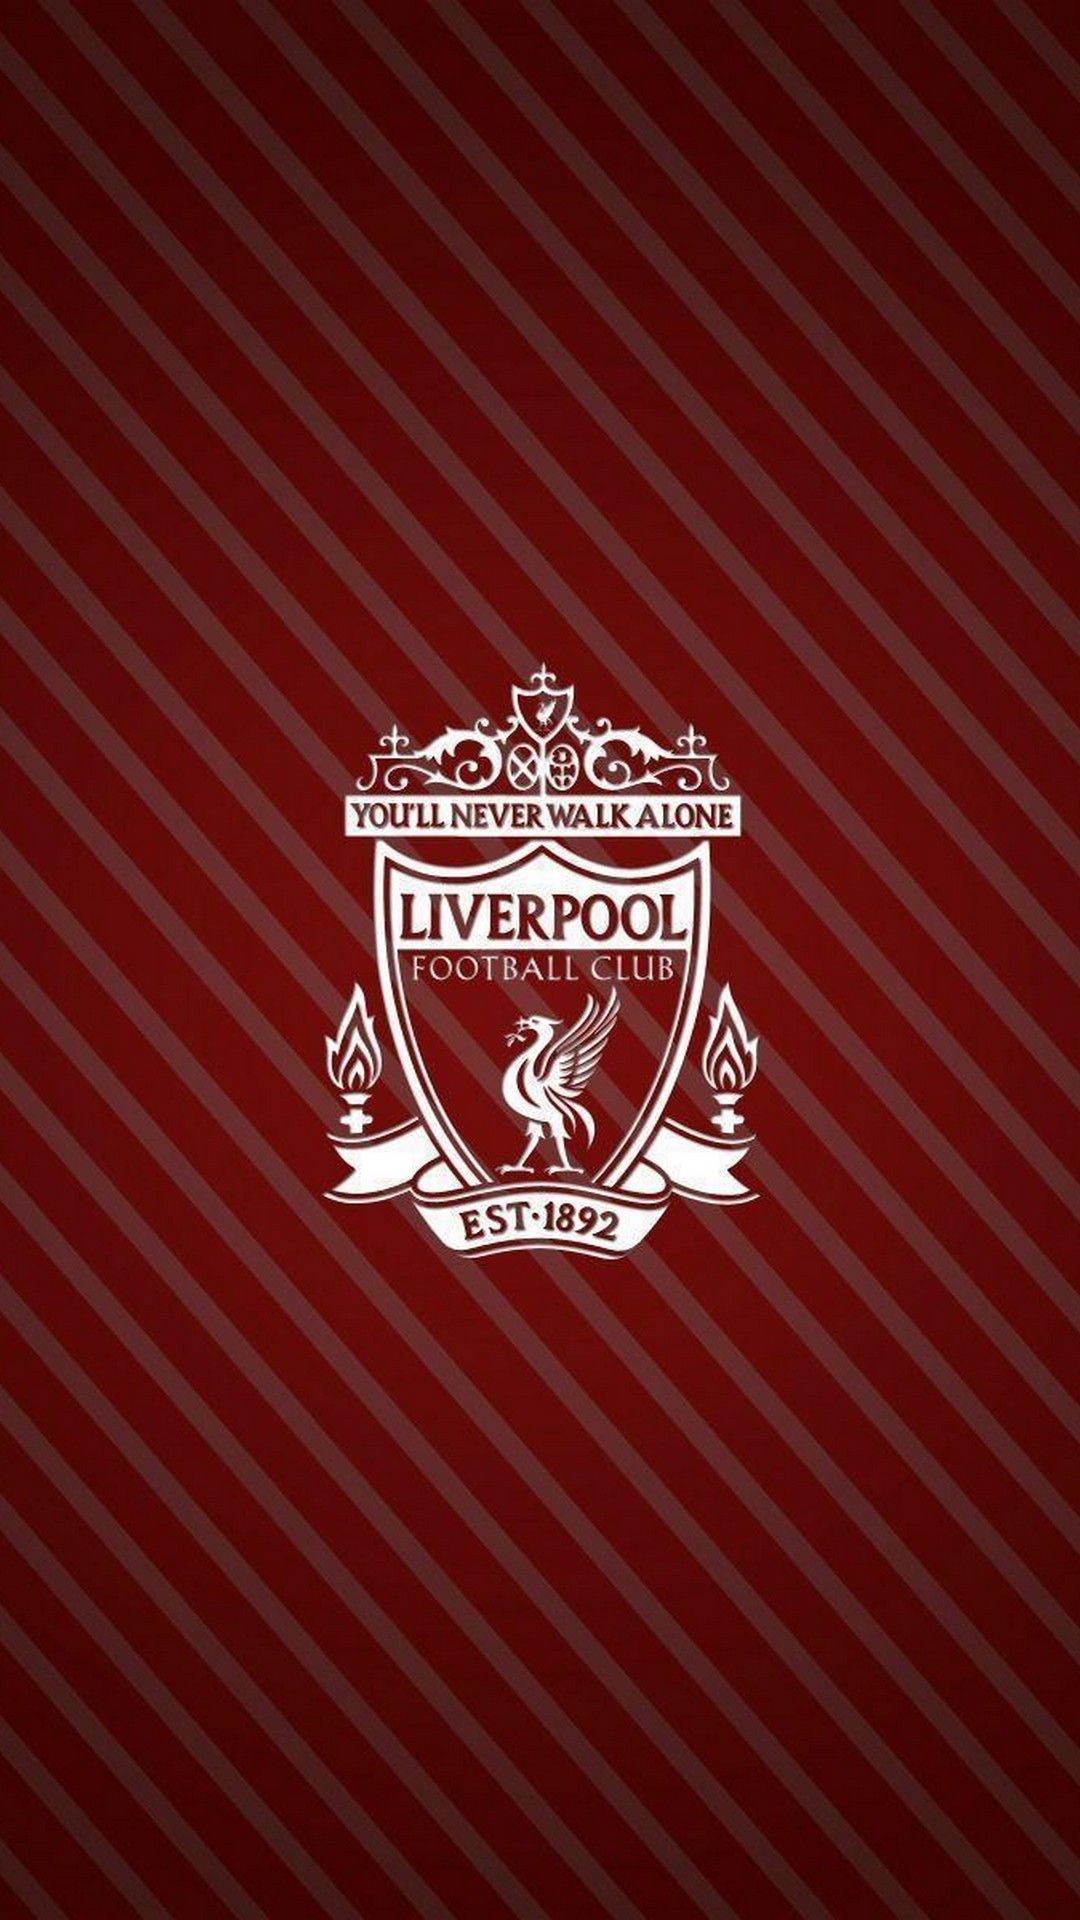 Liverpool Hd Wallpapers For Mobile สโมสรฟ ตบอลล เวอร พ ล ร ปท ม